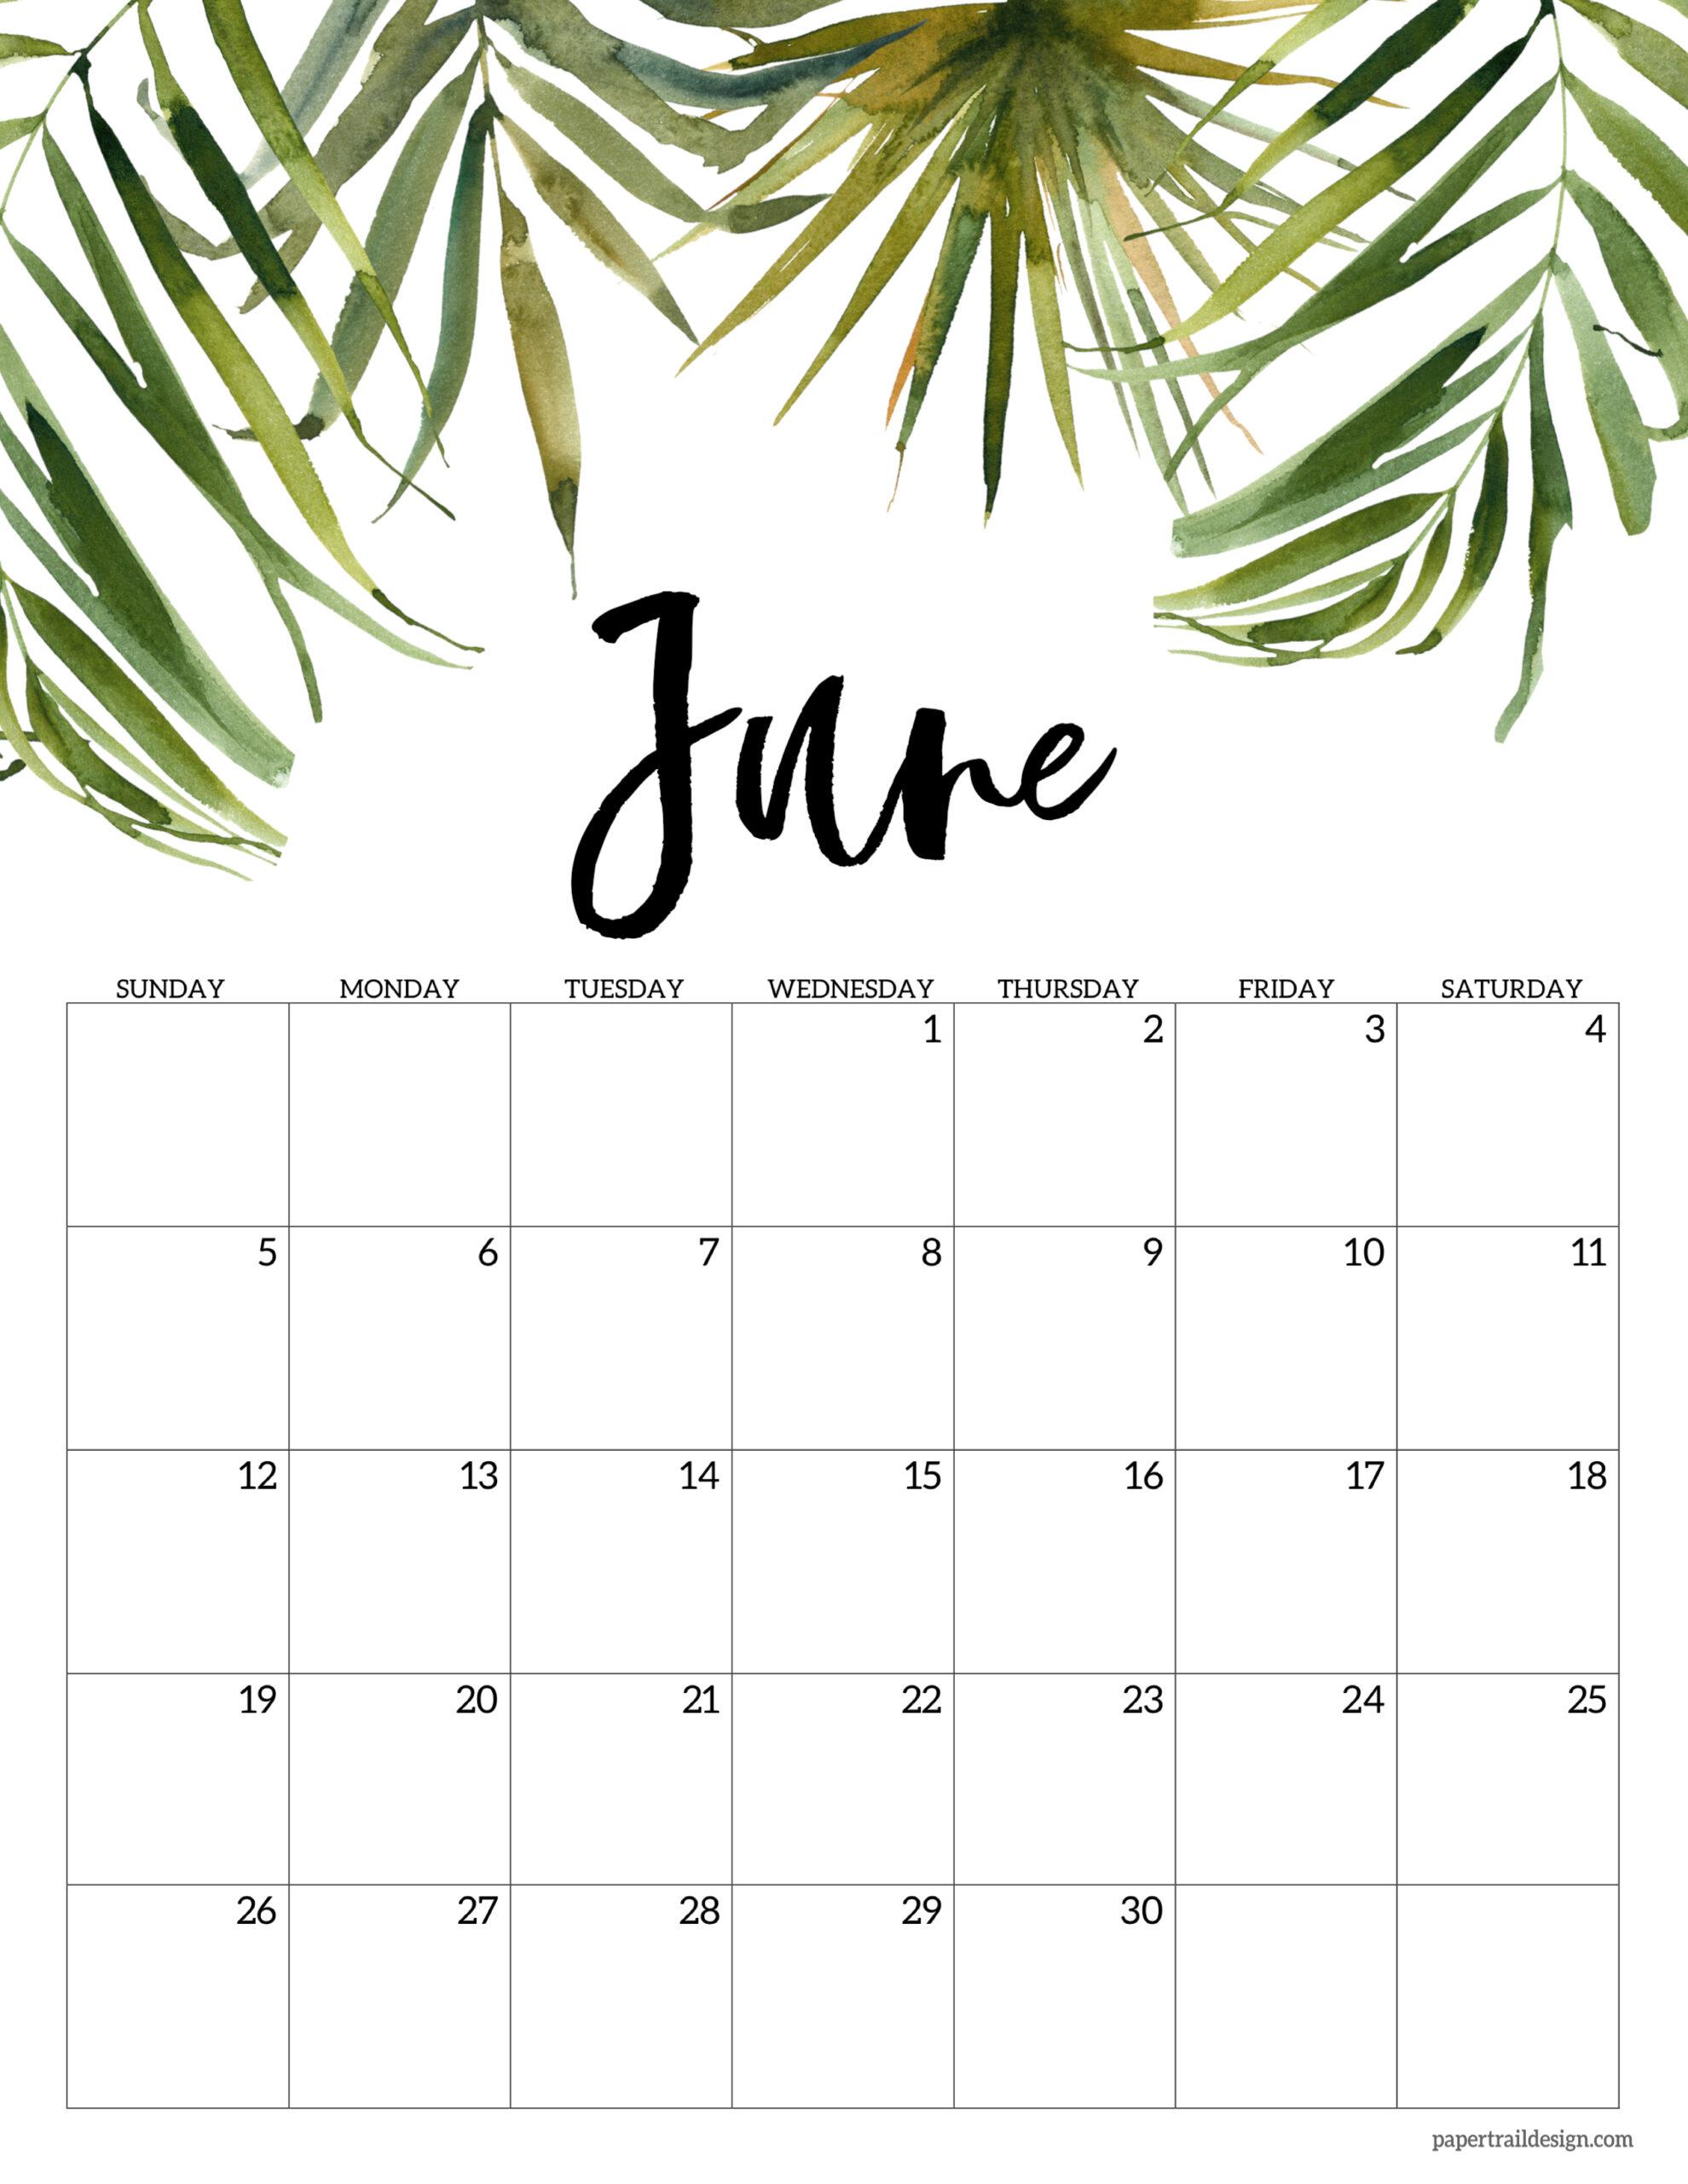 Blank Calendar For June 2022.Free 2022 Calendar Printable Floral Paper Trail Design